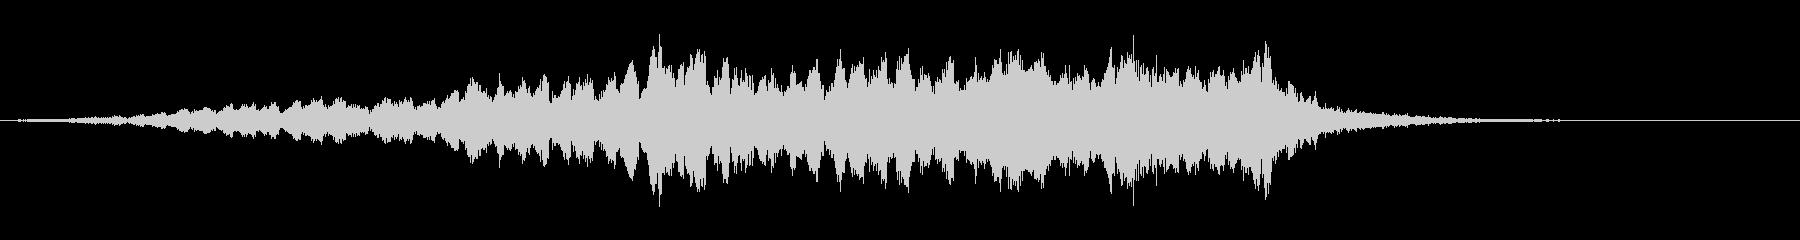 SWELL ゲート逆ノイズスウェル05の未再生の波形